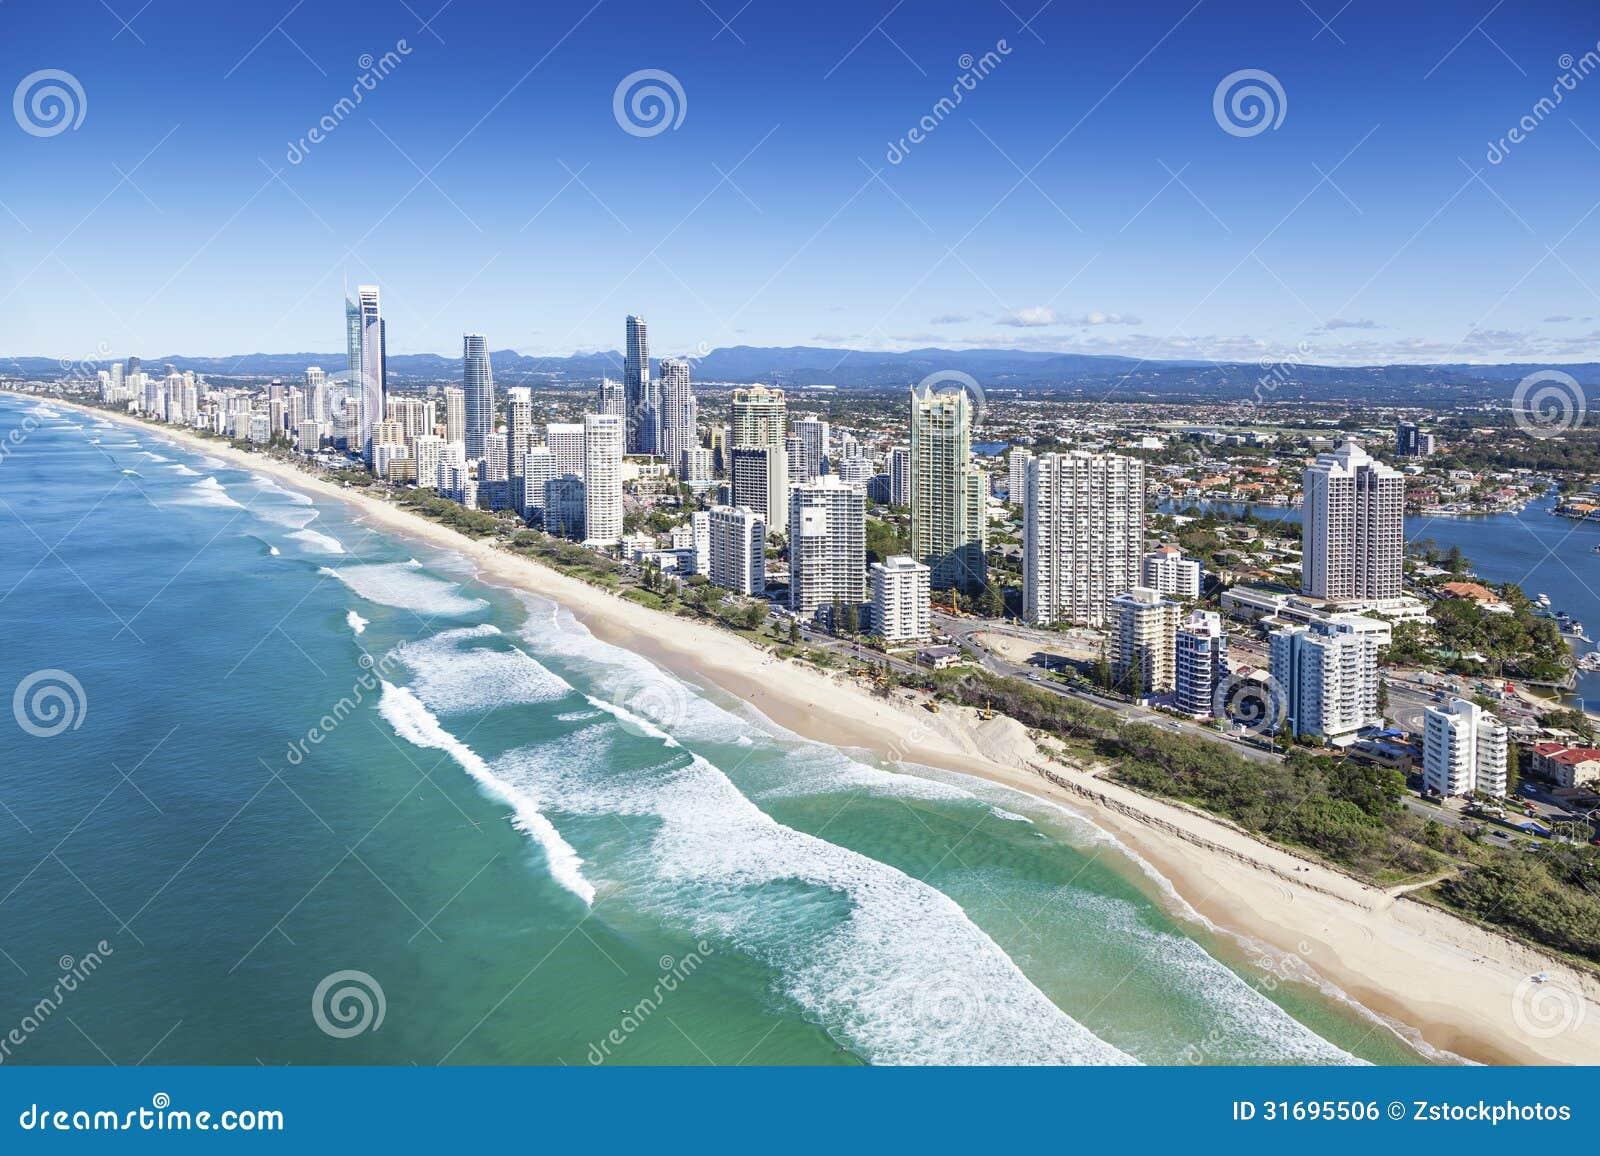 Gold Coast Queensland Australia Royalty Free Stock Image